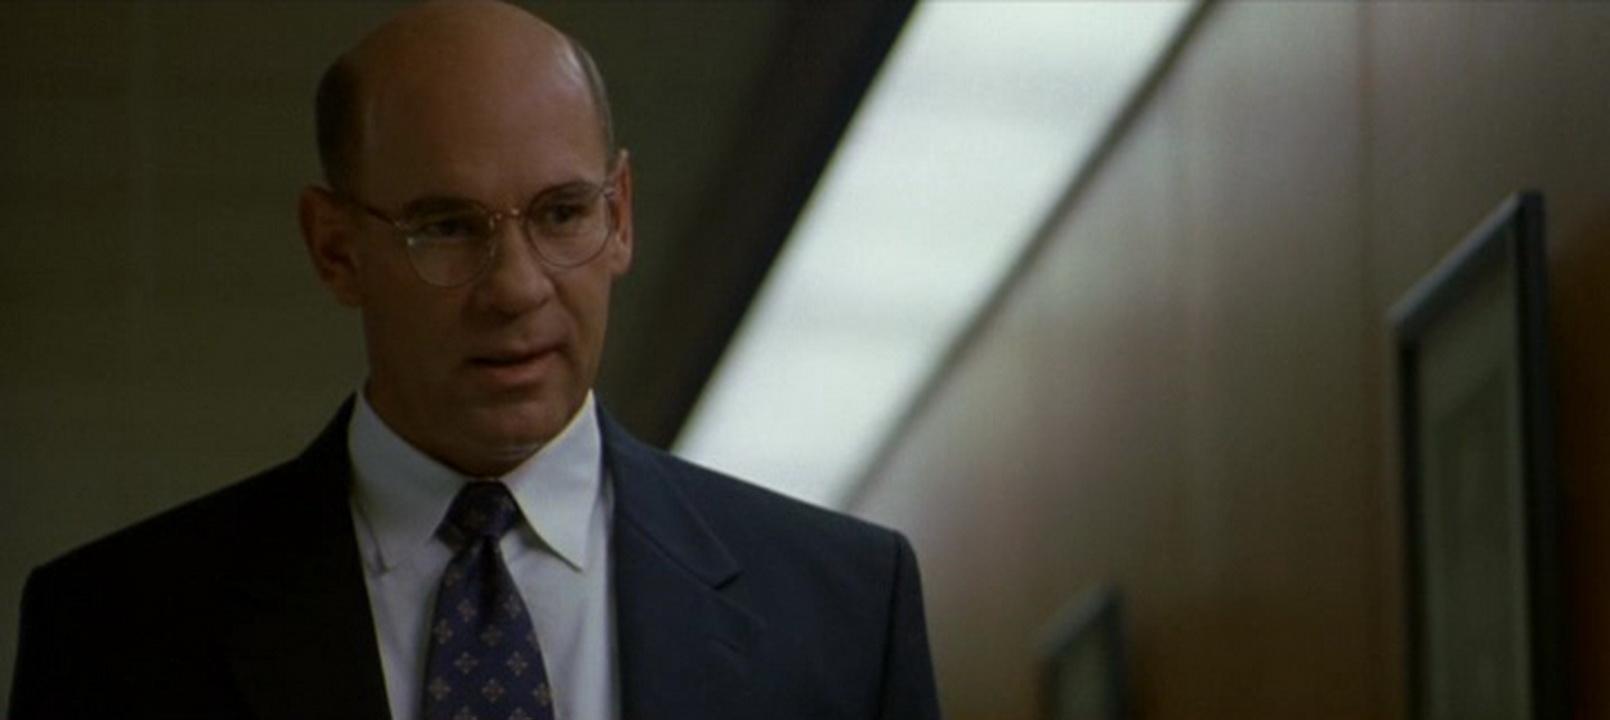 مشاهدة فيلم The X Files 1998 HD مترجم كامل اون لاين